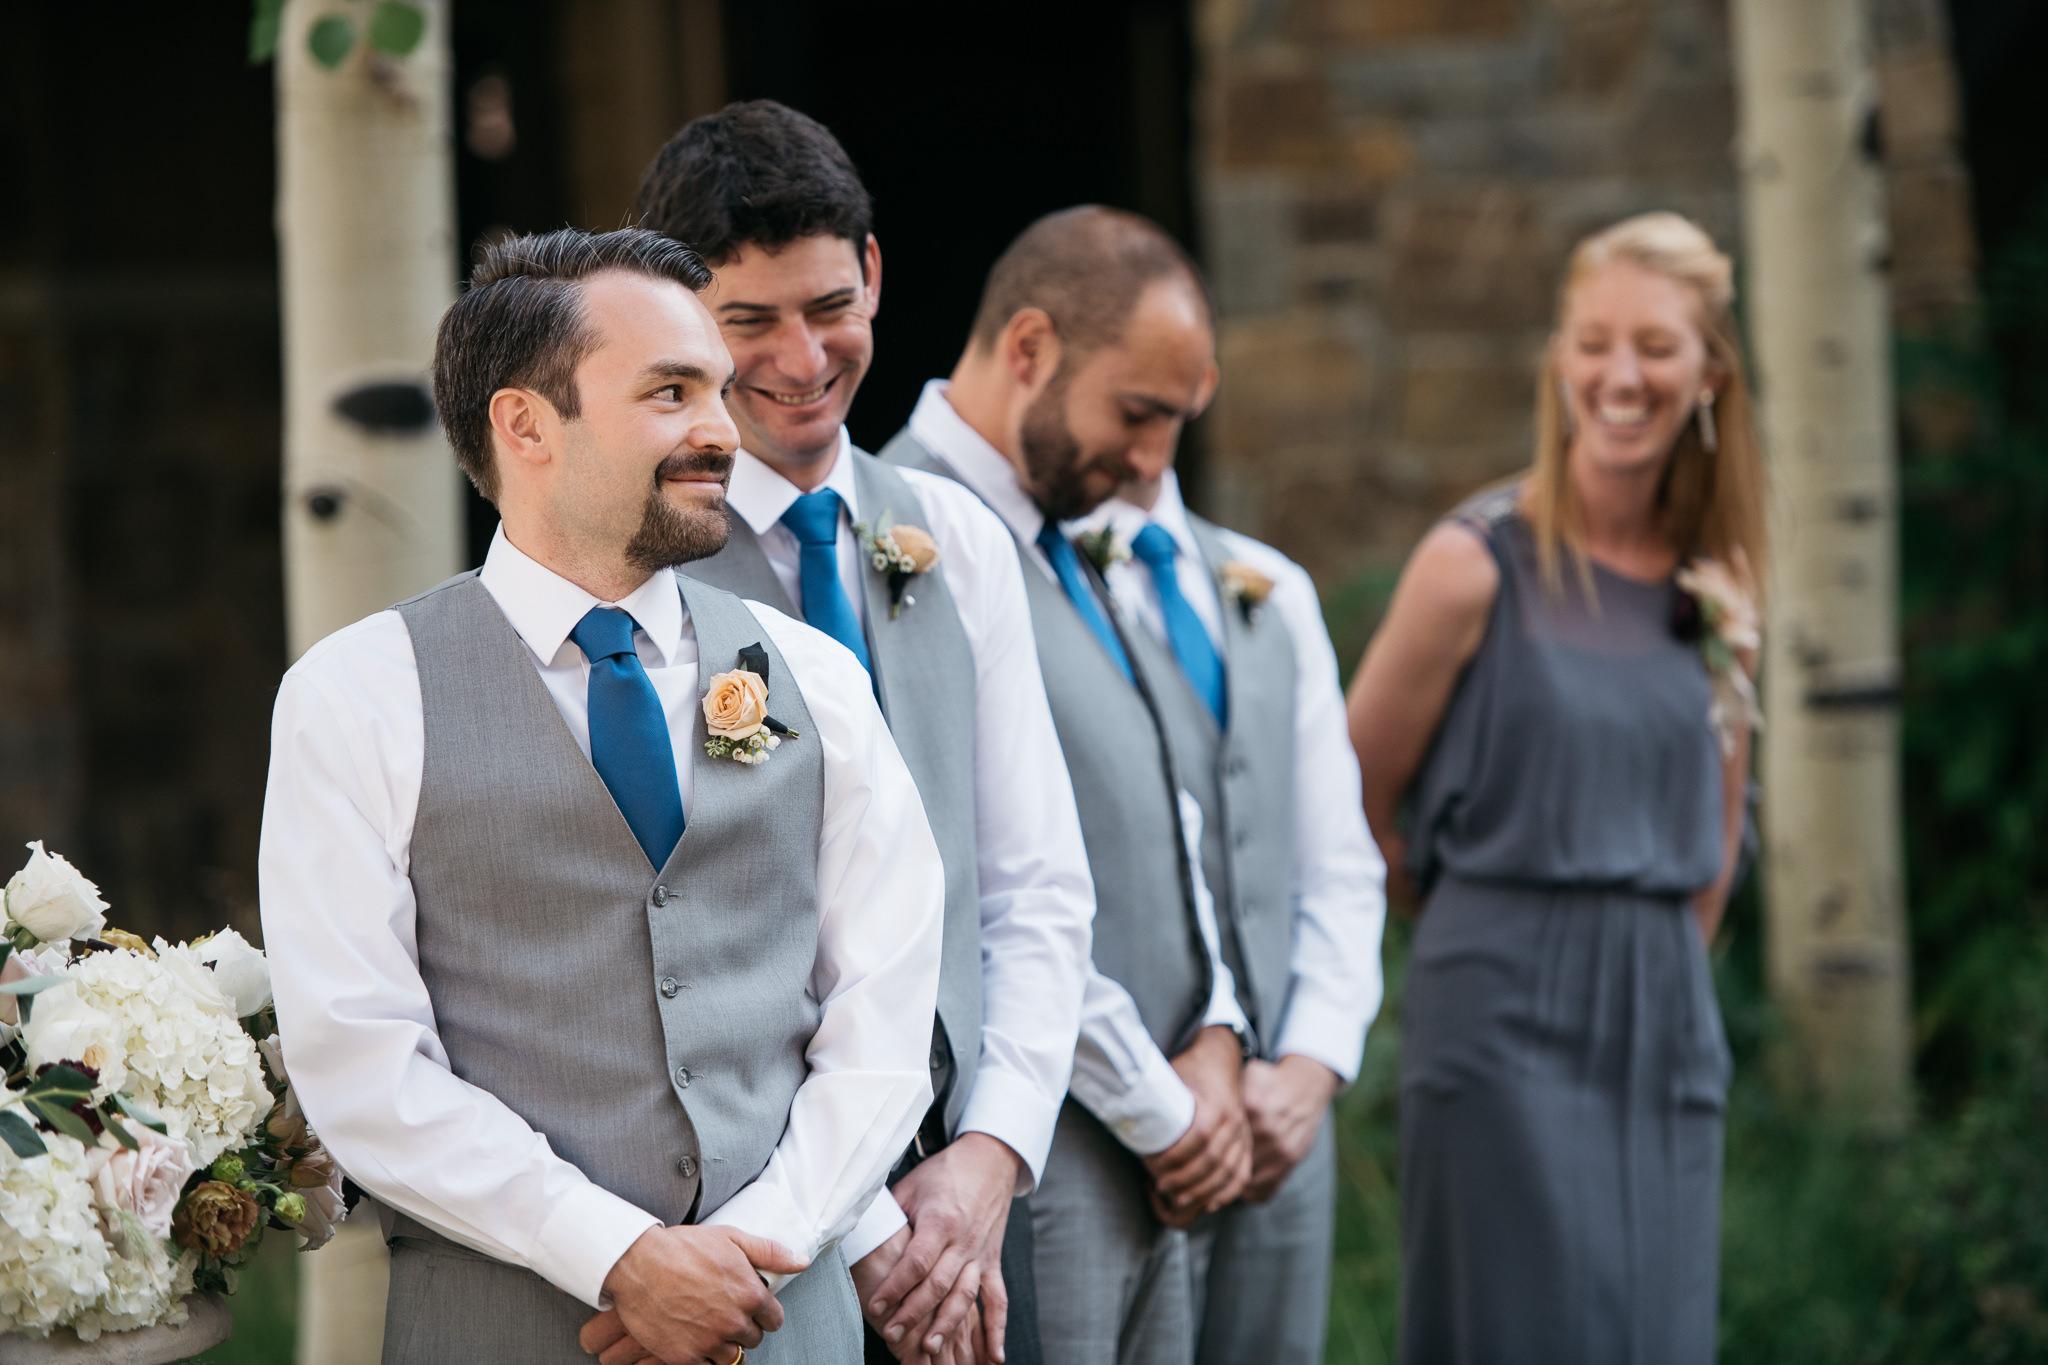 267_ONL_Kat_Nick_Wedding_Trevor_Hooper_Photo.jpg